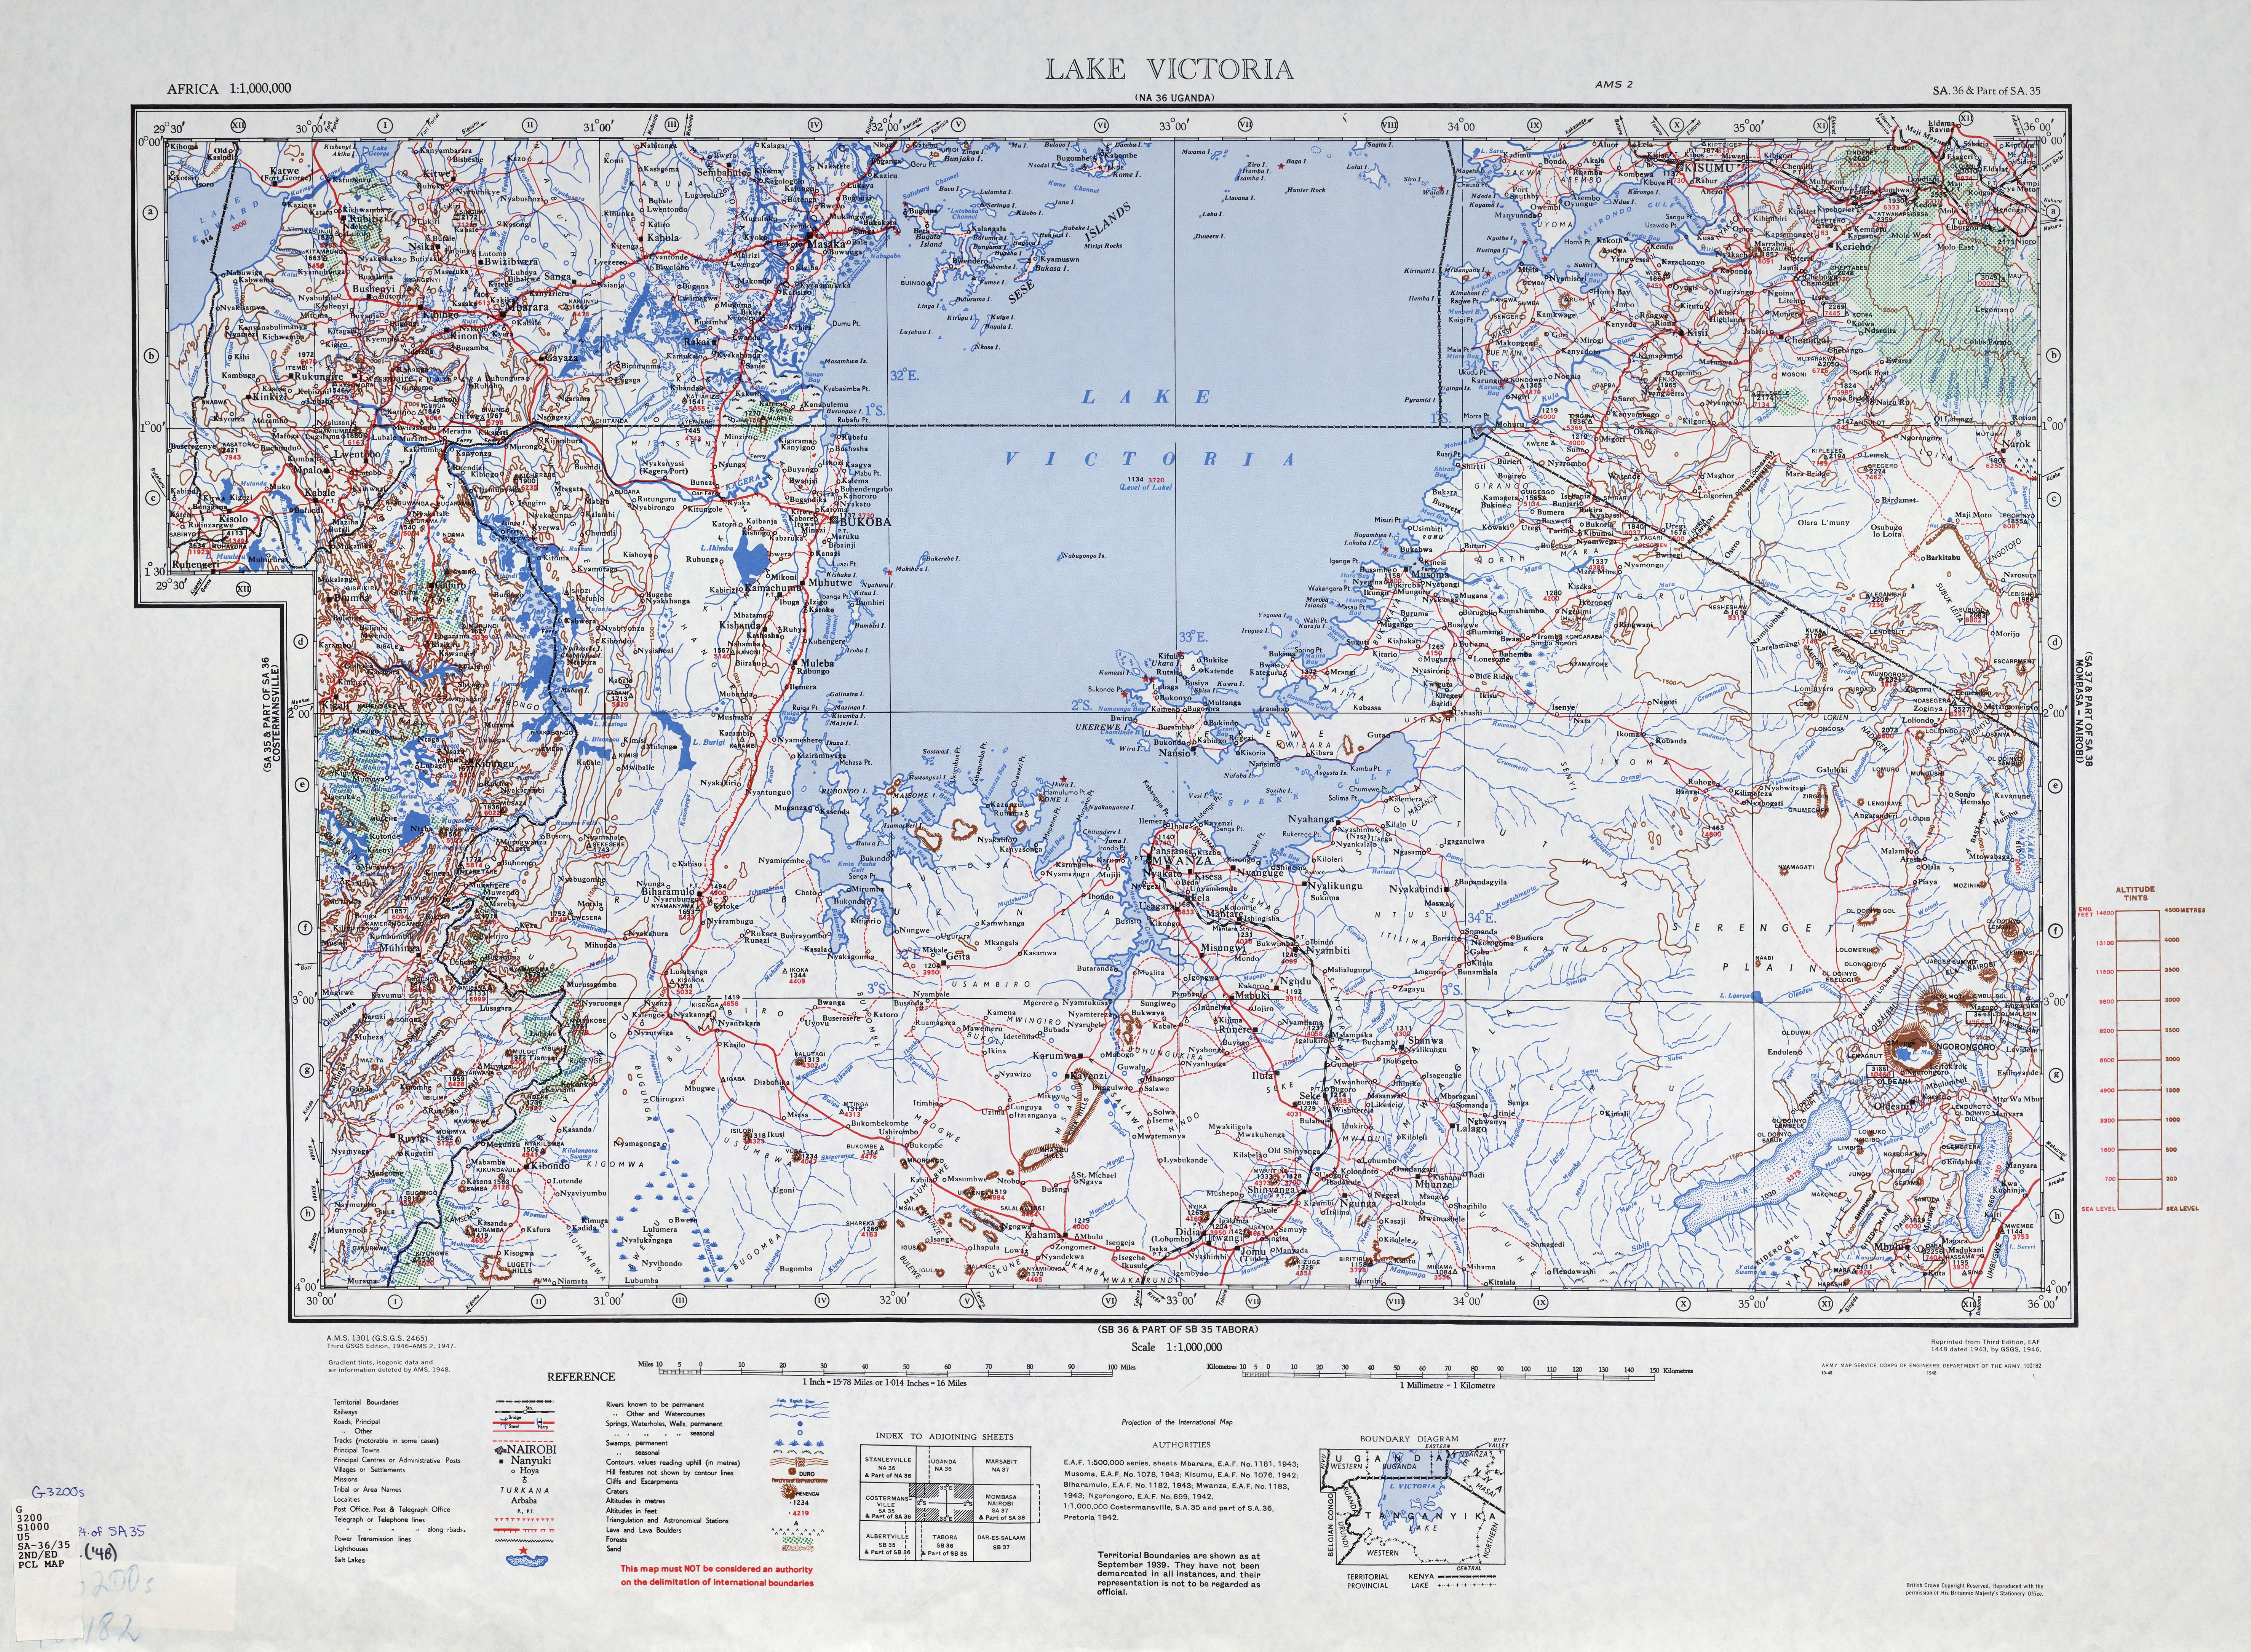 Map of Northern Tanganyika and Lake Victoria, 1948